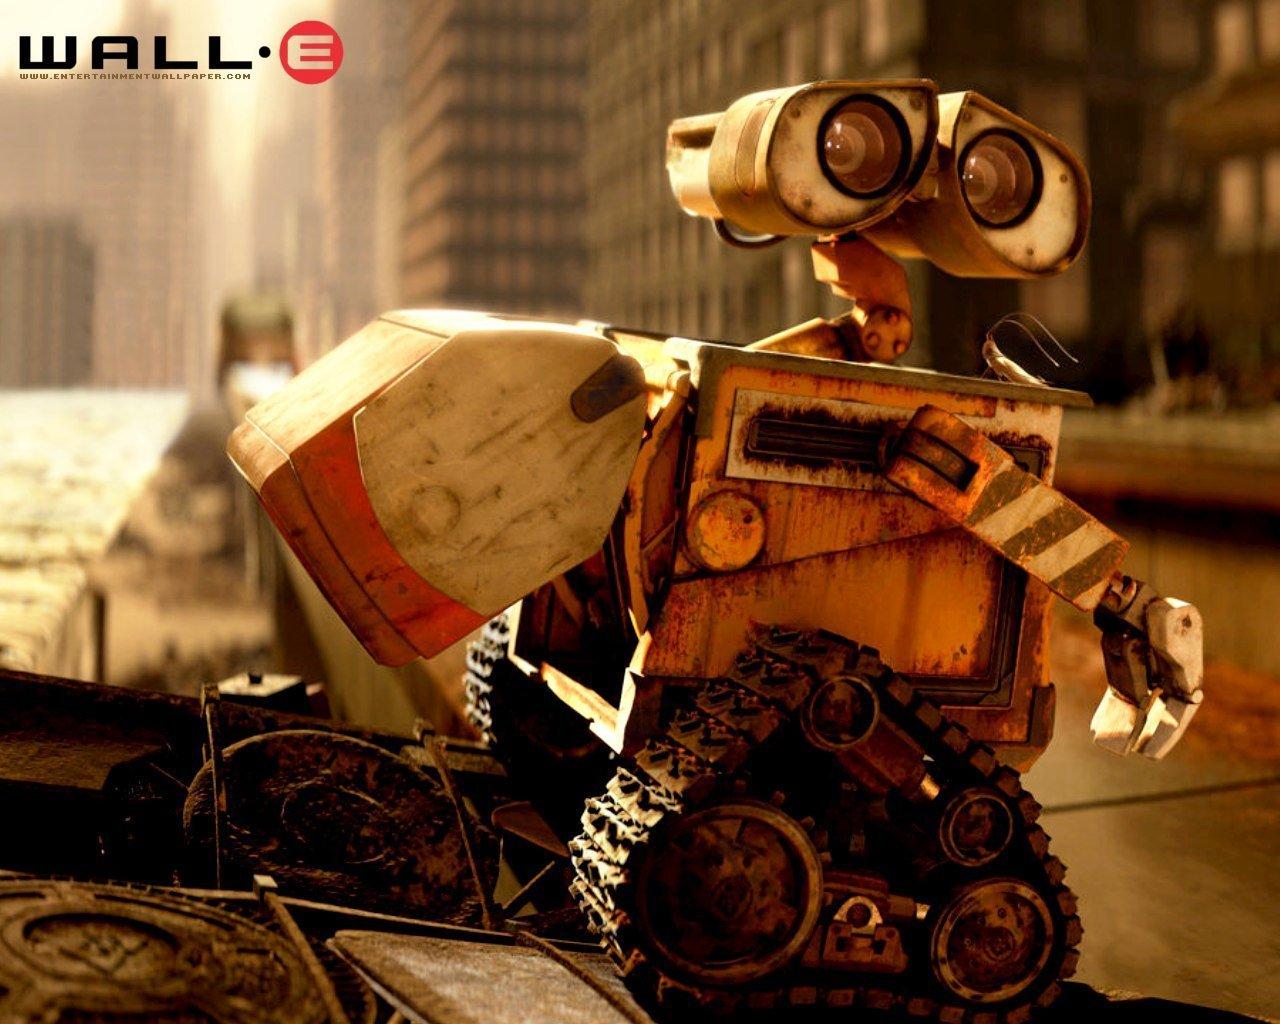 WALL-E WALL-PAPER